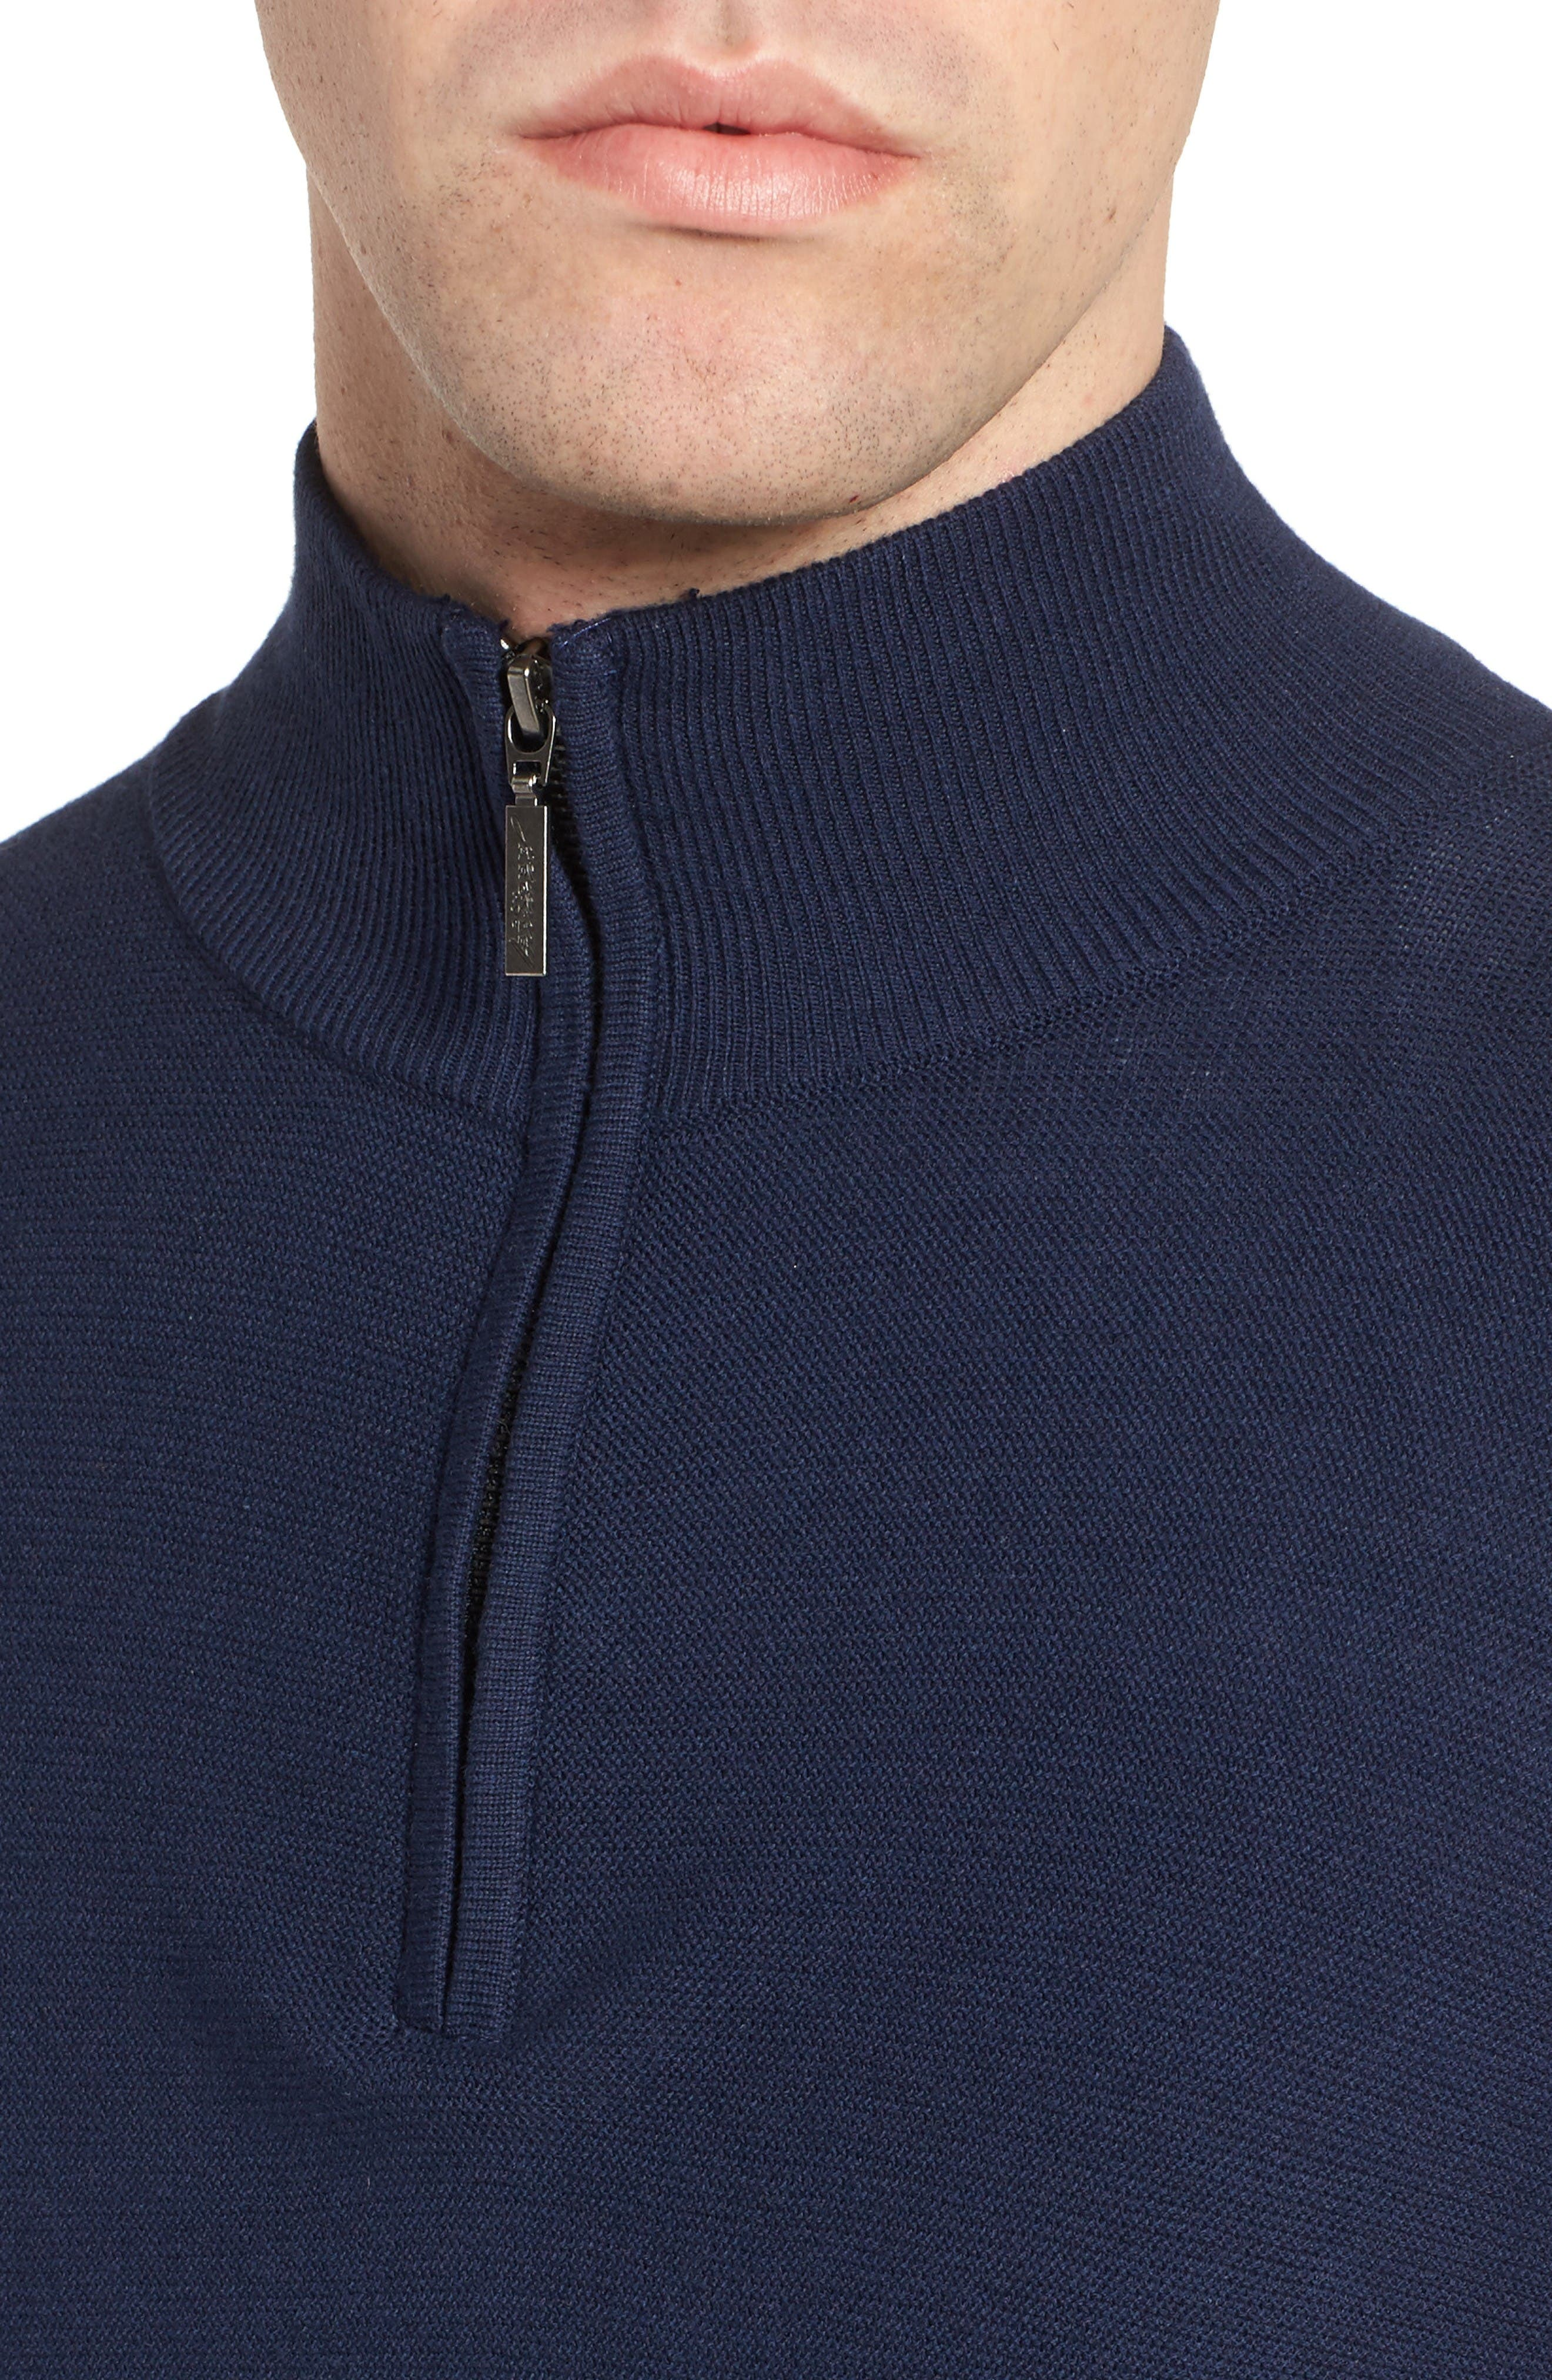 Quarter Zip Sweater,                             Alternate thumbnail 4, color,                             Navy